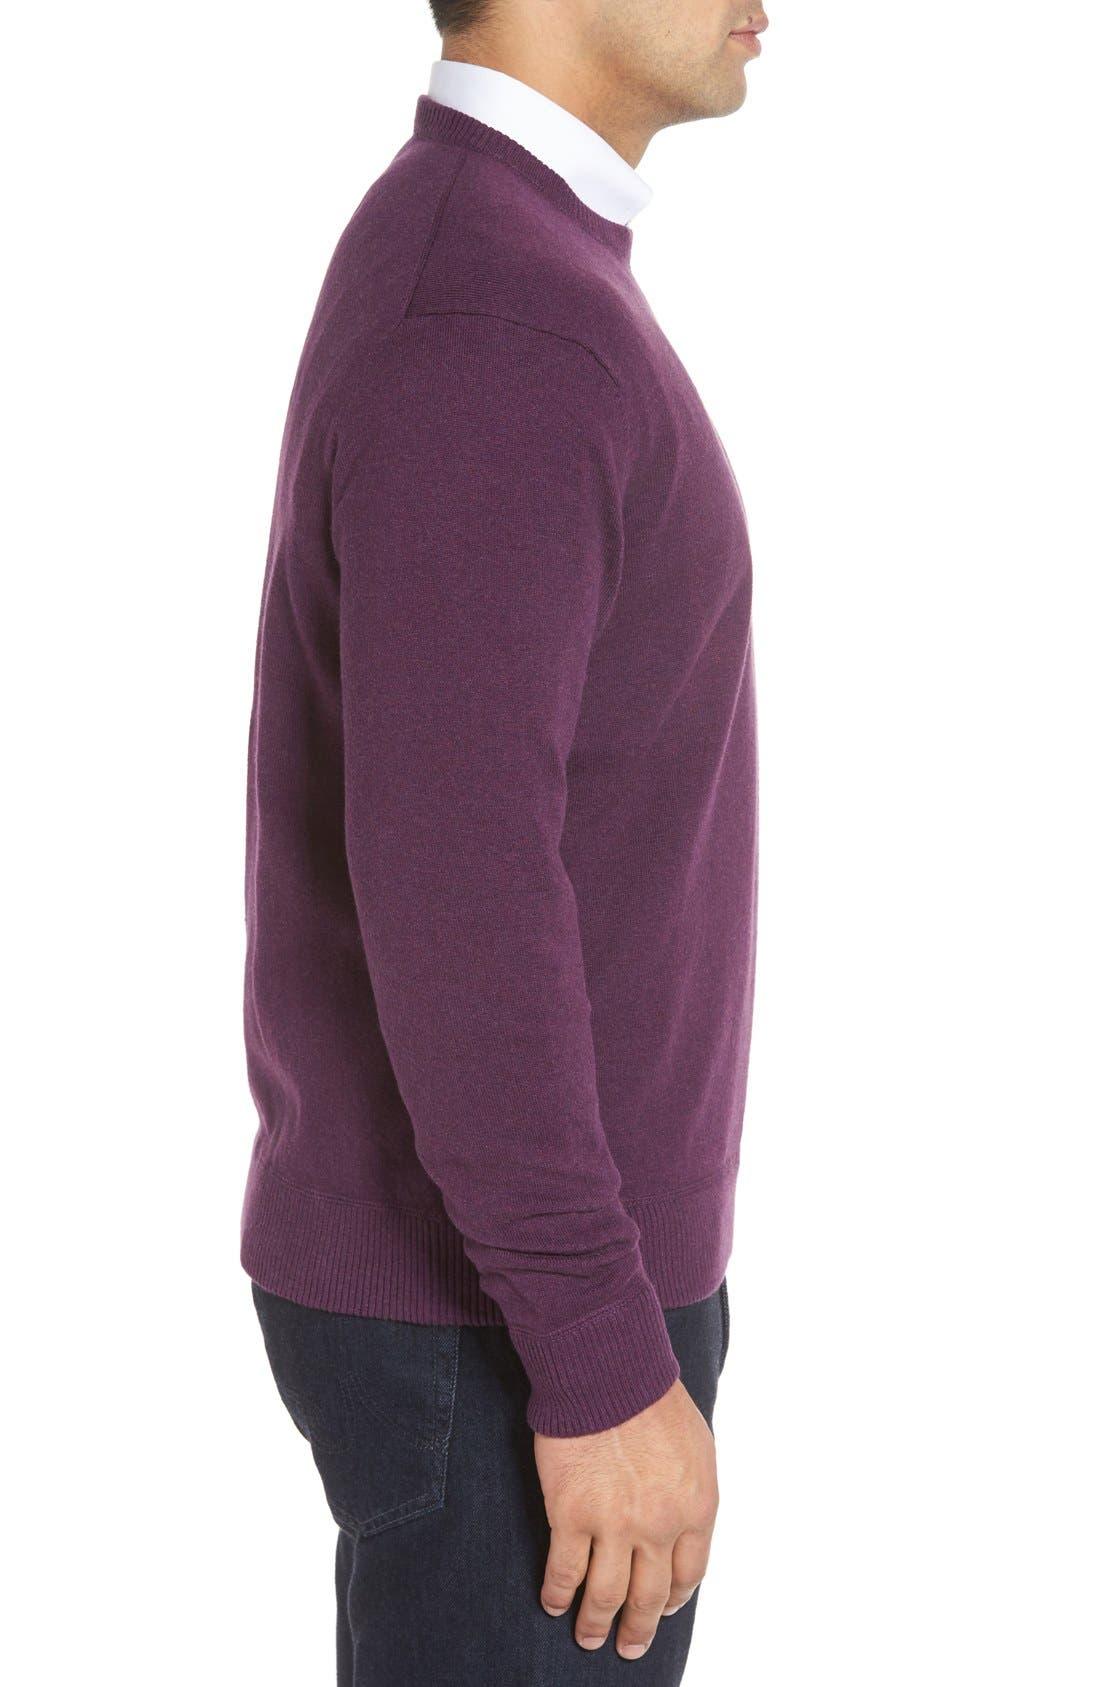 'Jersey Sport' Cotton Blend Crewneck Sweater,                             Alternate thumbnail 22, color,